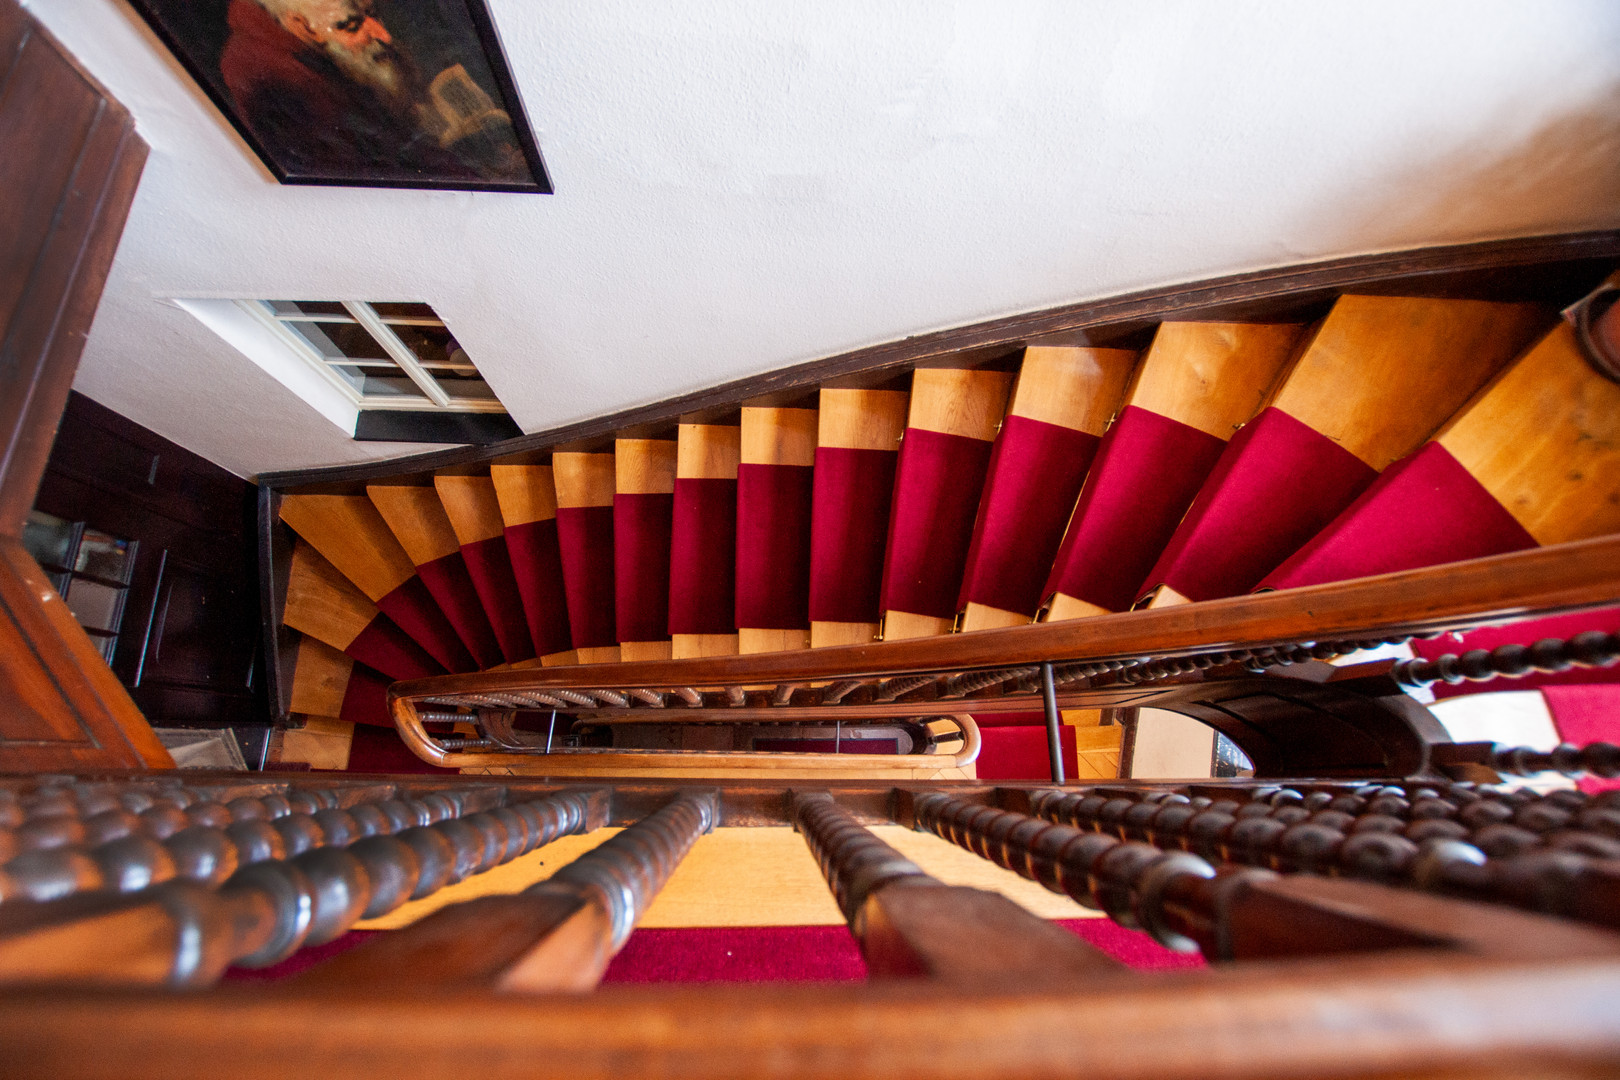 Treppenhaus im Renaissance Stil